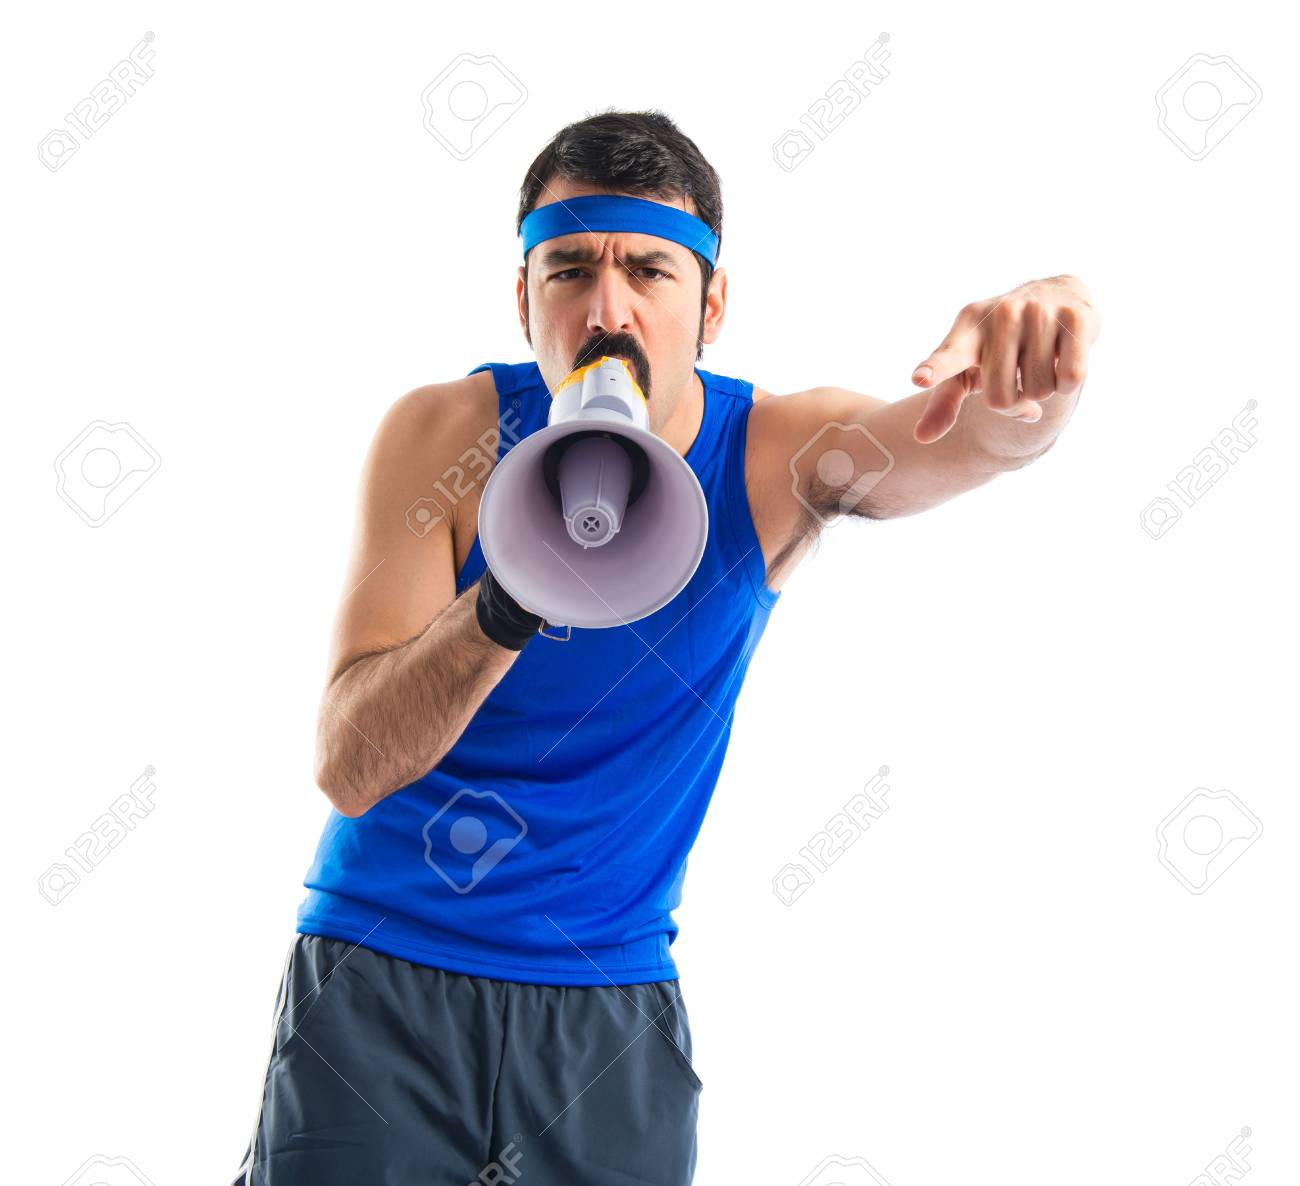 Sportman shouting by megaphone - 36559838